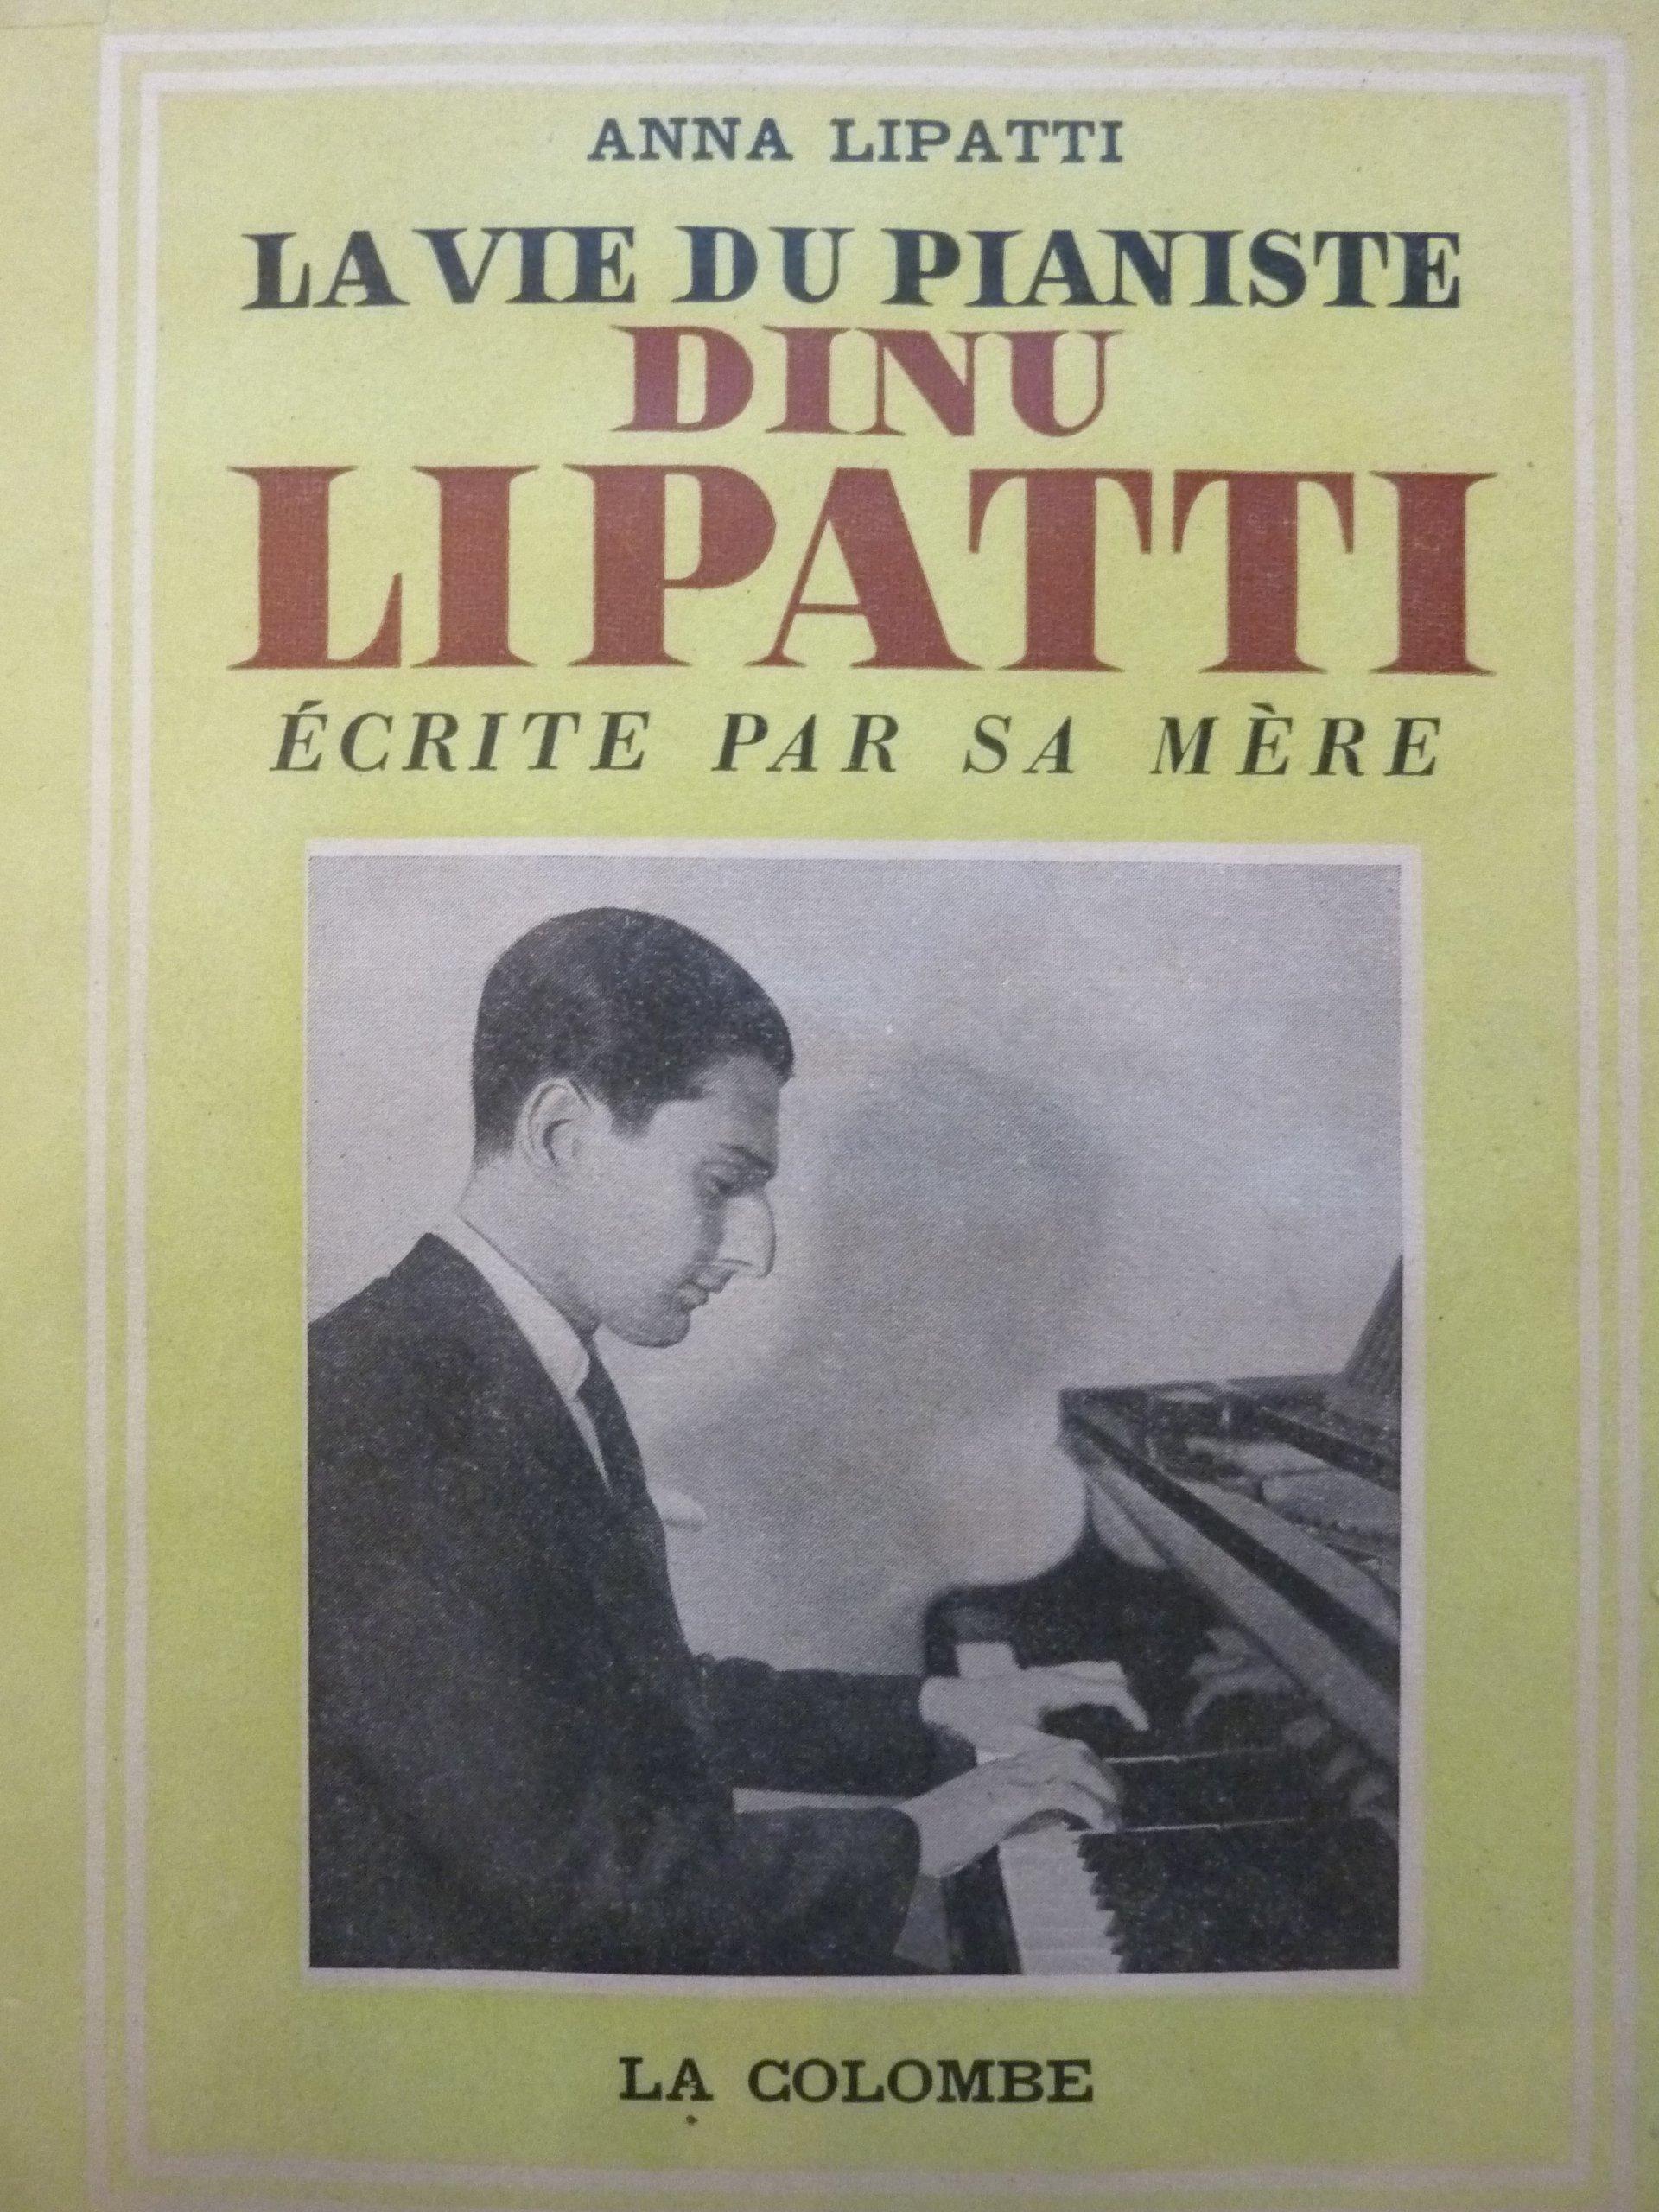 Amazon Fr La Vie Du Pianiste Dinu Lipatti Ecrite Par Sa Mere Anna Lipatti Livres